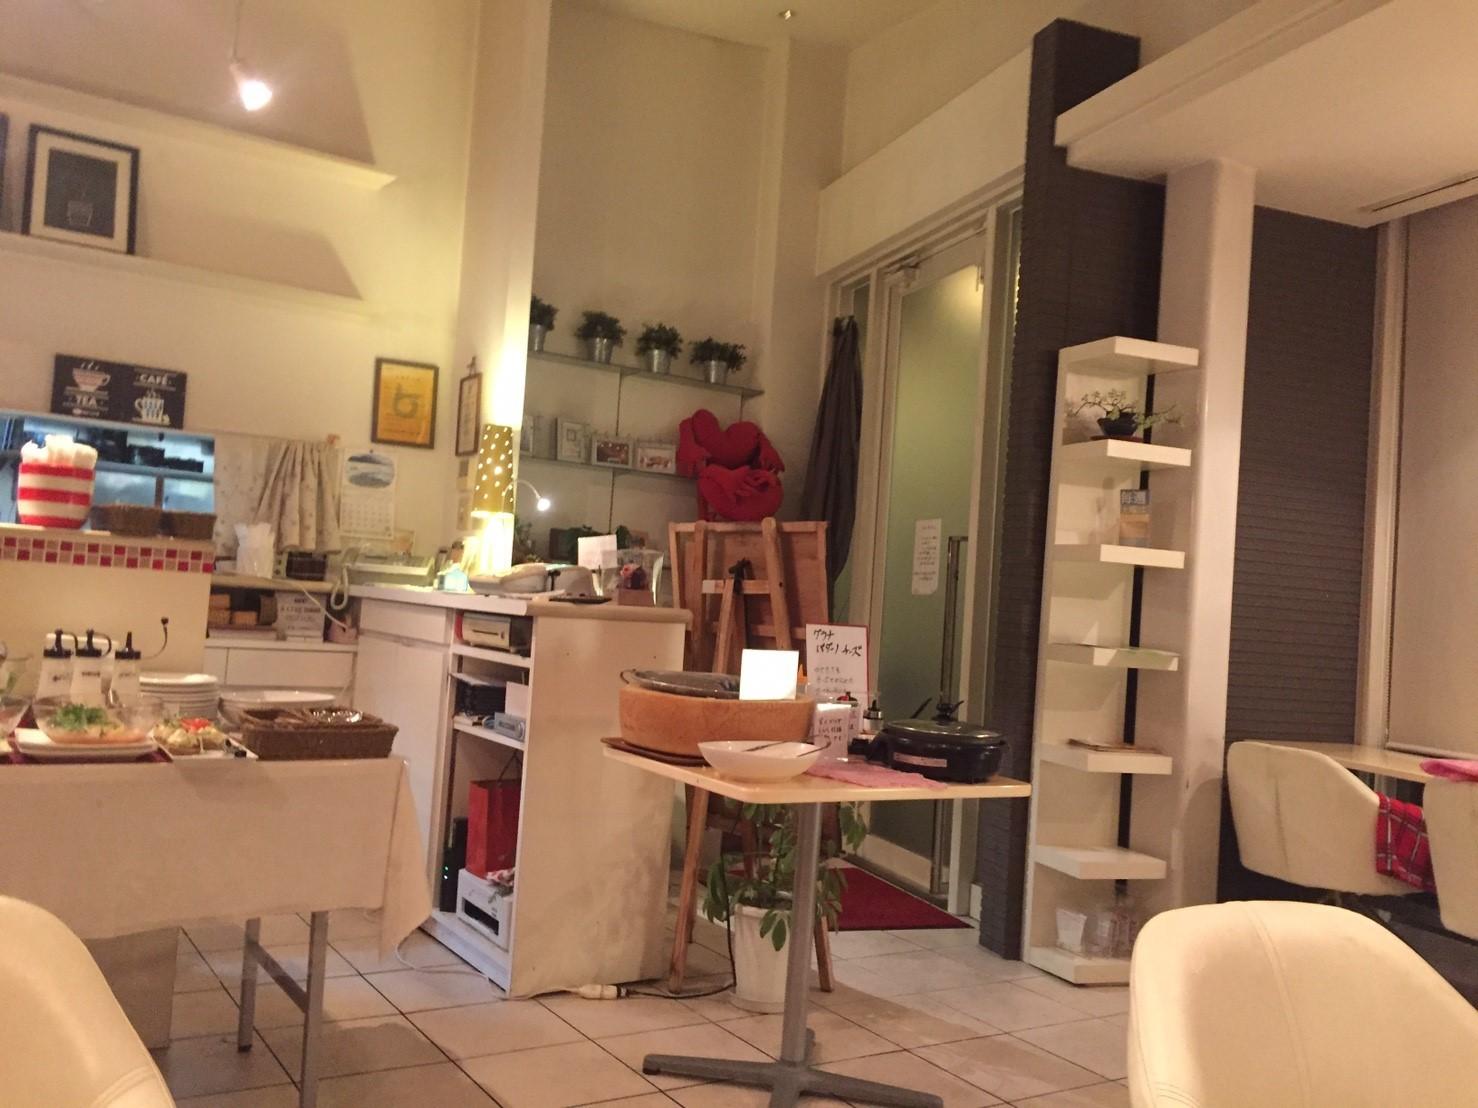 cafe coeur ディナービュッフェ_e0115904_02504314.jpg